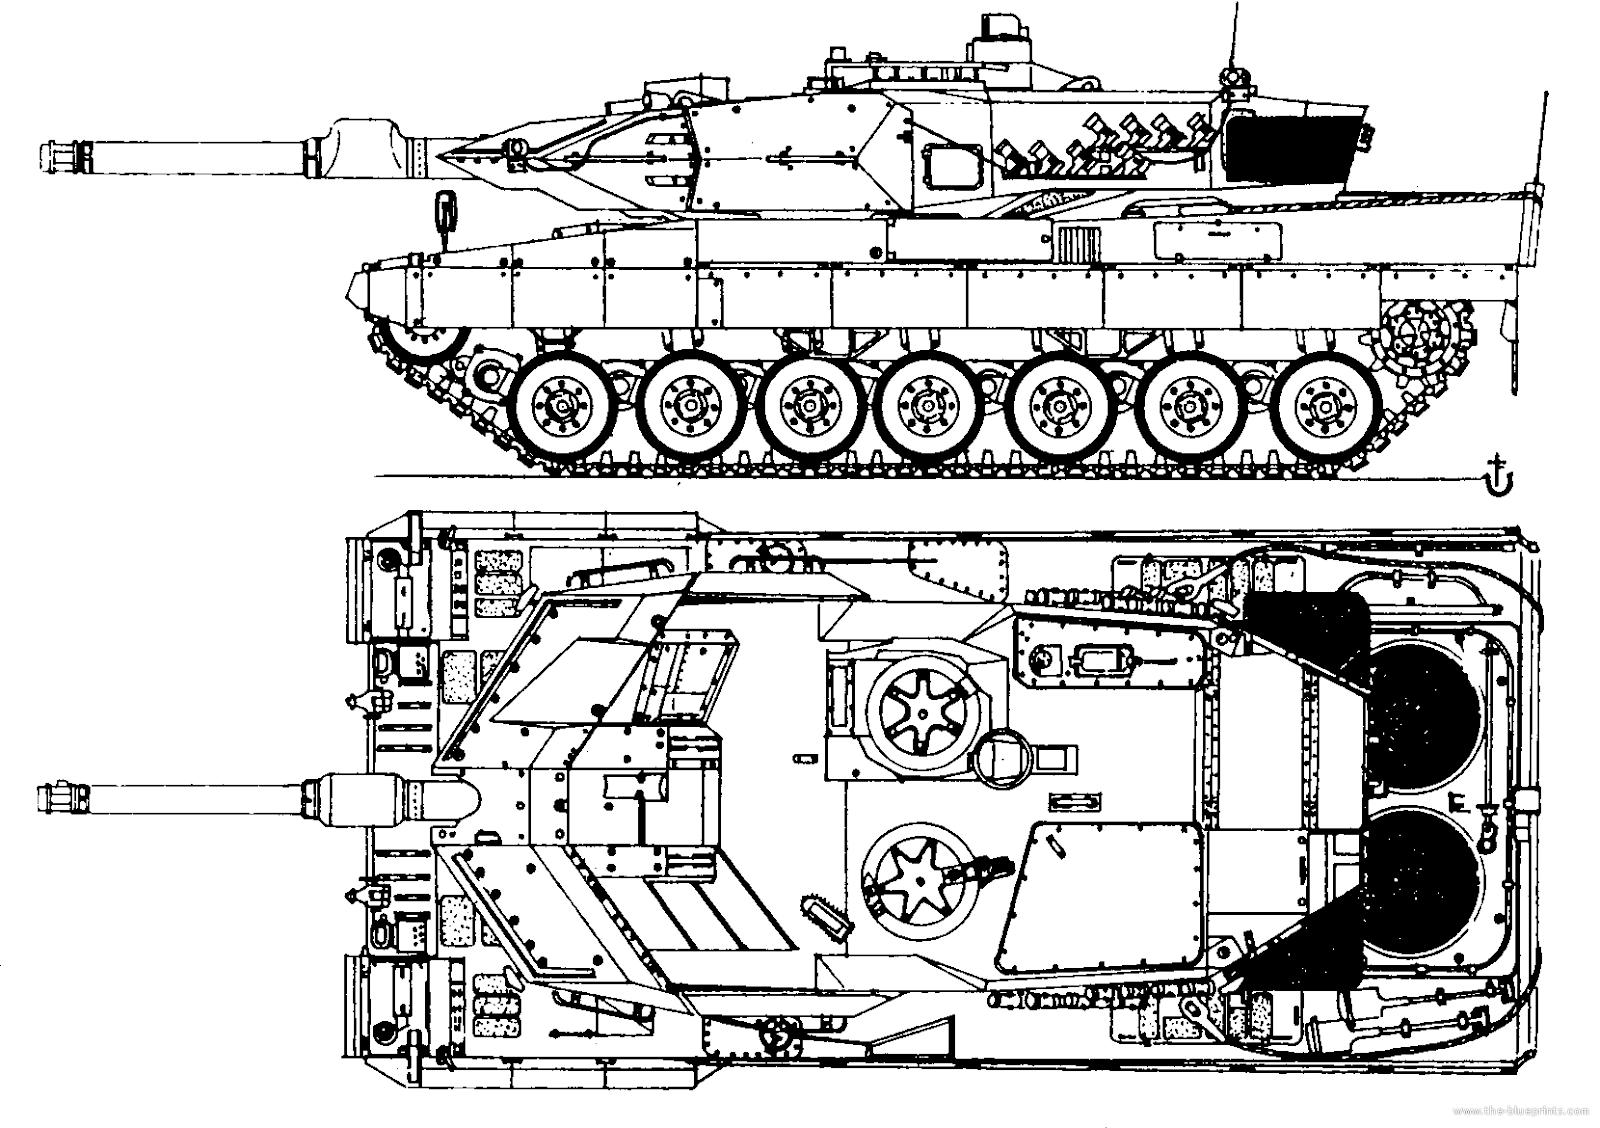 Si Vis Pacem Para Bellum Leopard 2 Punto E Basta